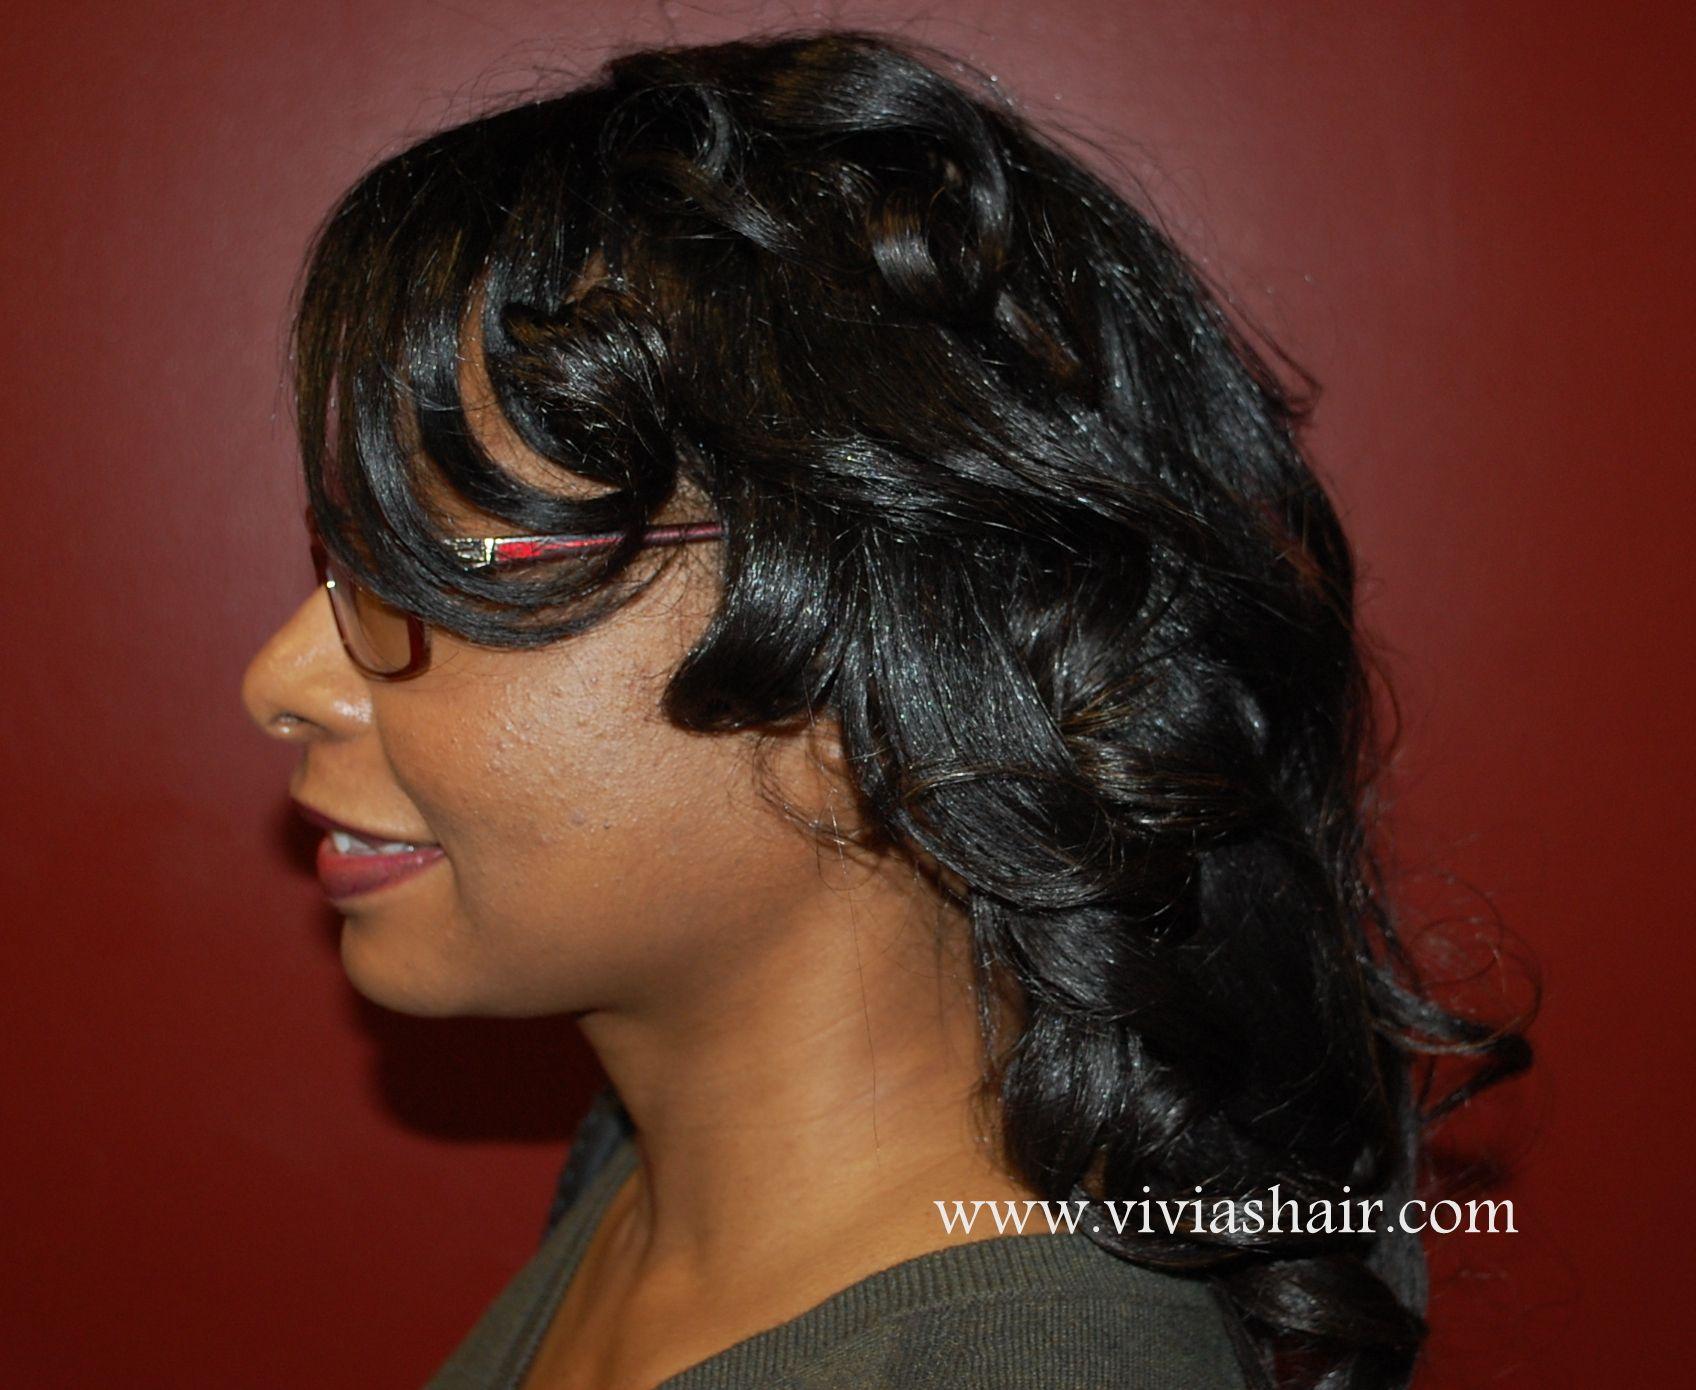 Hair Styles Hair Extensions Hair Salon Beauty Salon Pinterest